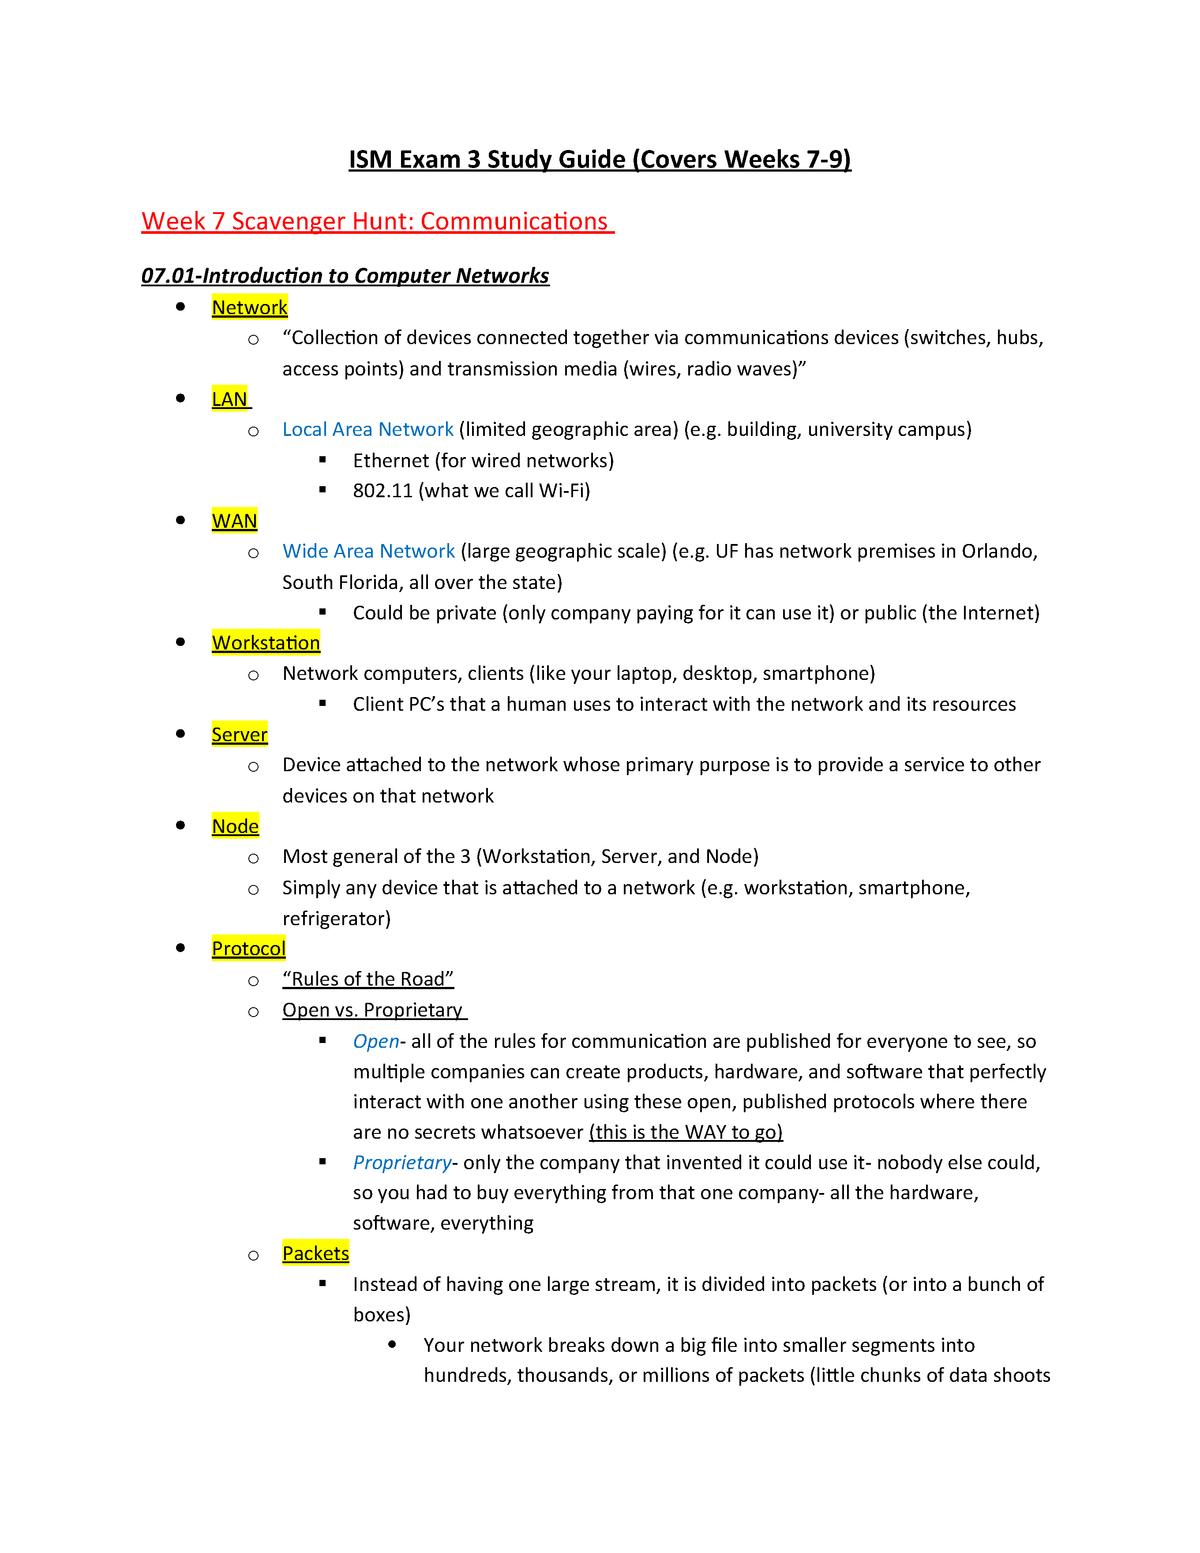 Exam 2018 - ISM 3004: Compu In Bus Environ - StuDocu Usi Comcast Wiring Diagrams on